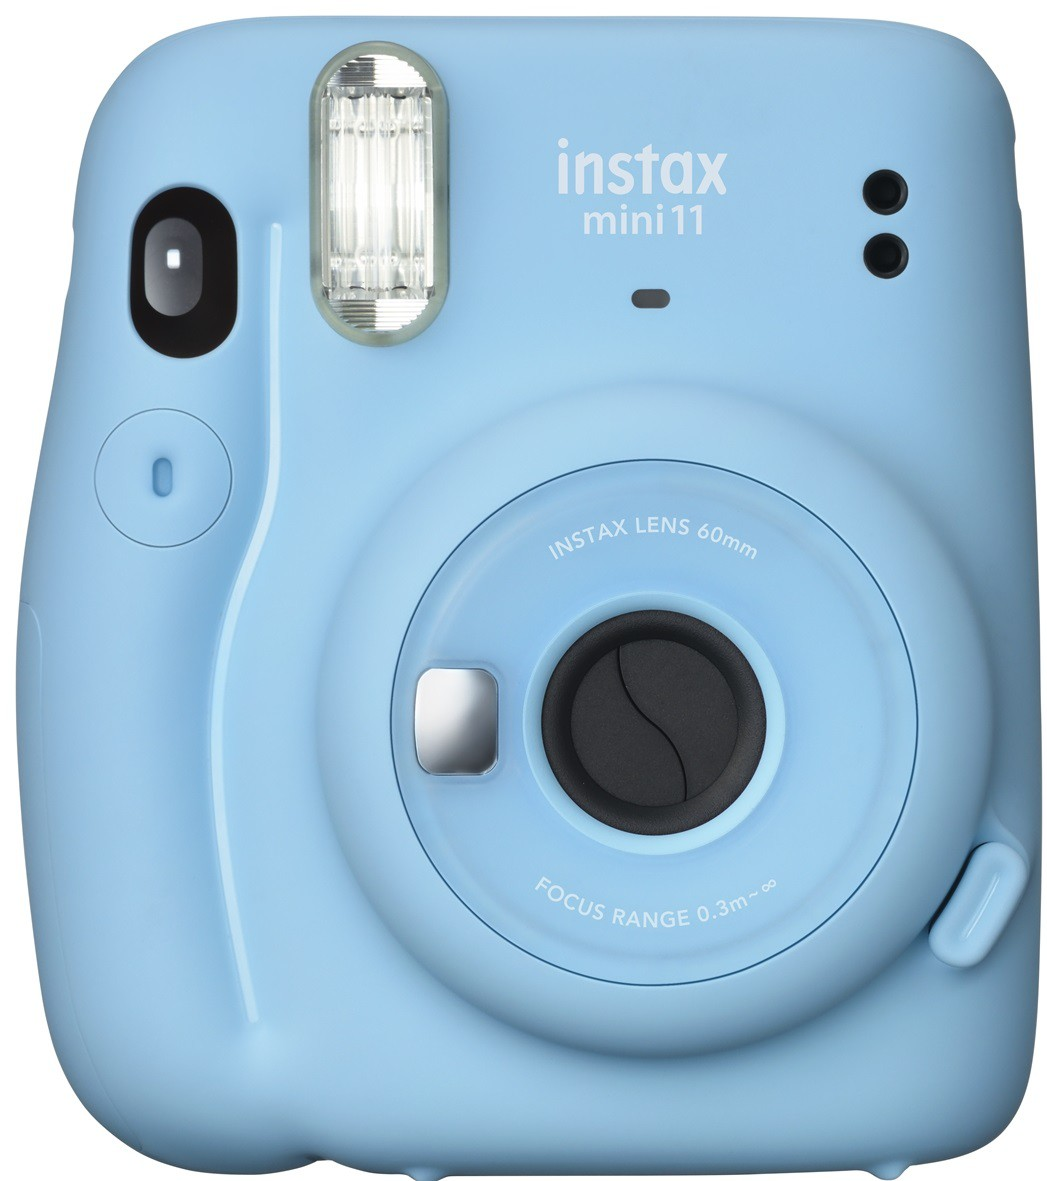 Kit Câmera Fujifilm Instax Mini 11 Azul + Kit 20 fotos